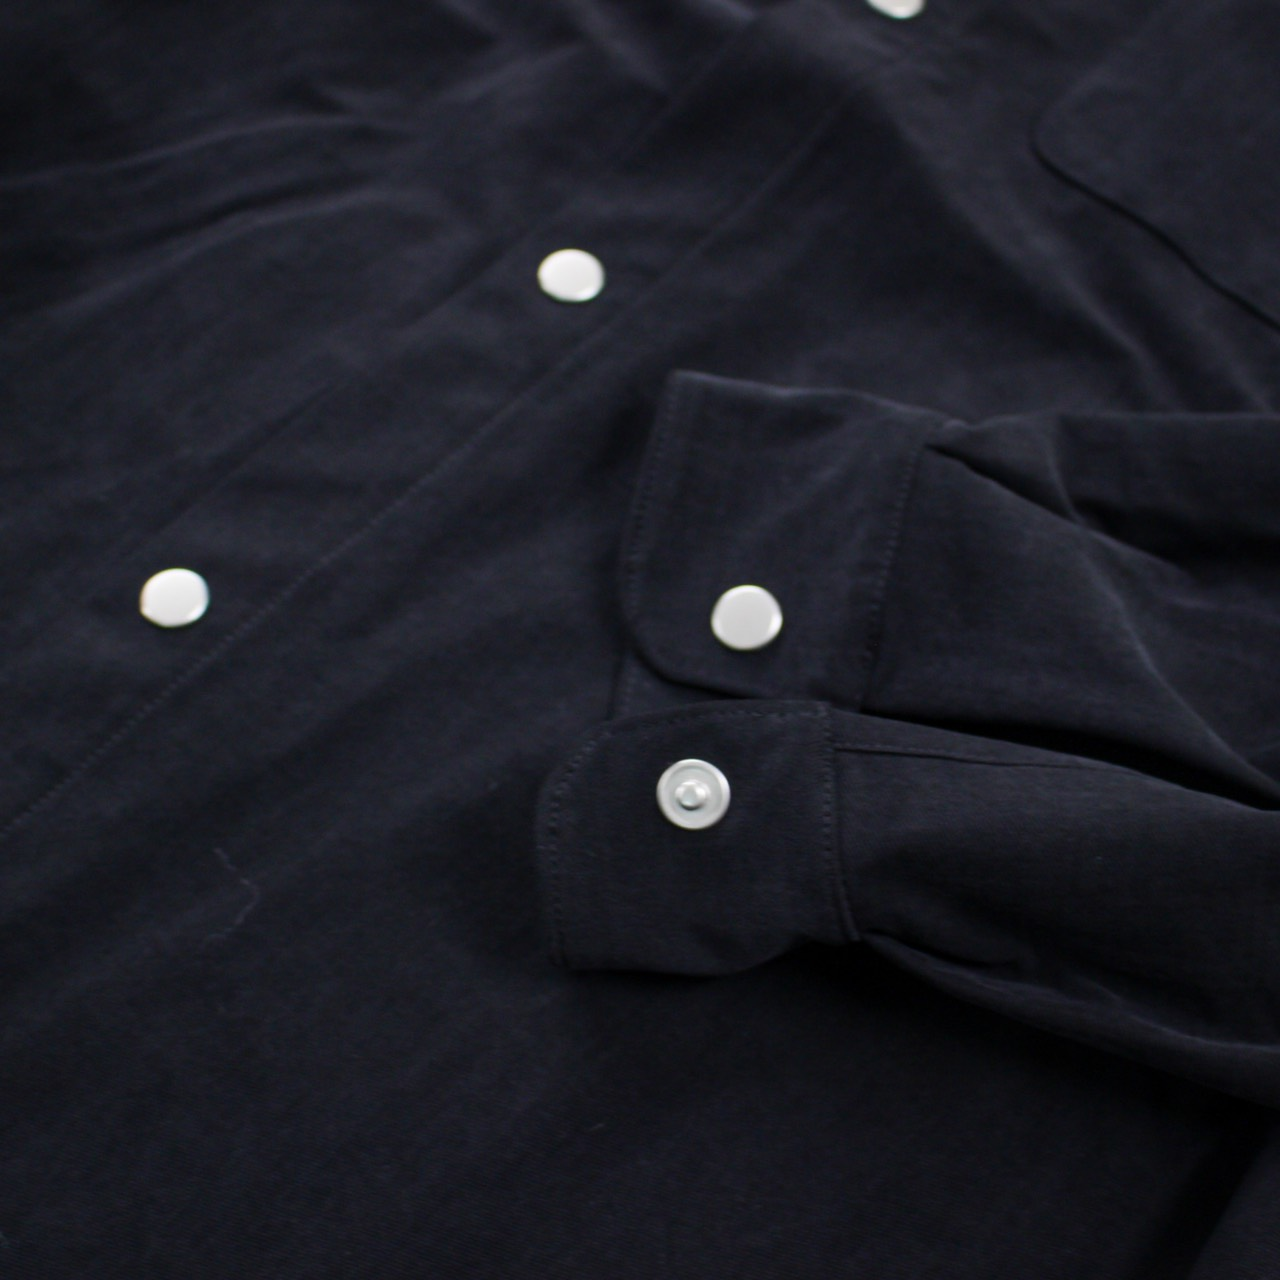 【sold out】Direction OCEANS Fibril Cupra Easy Shirt Blouson